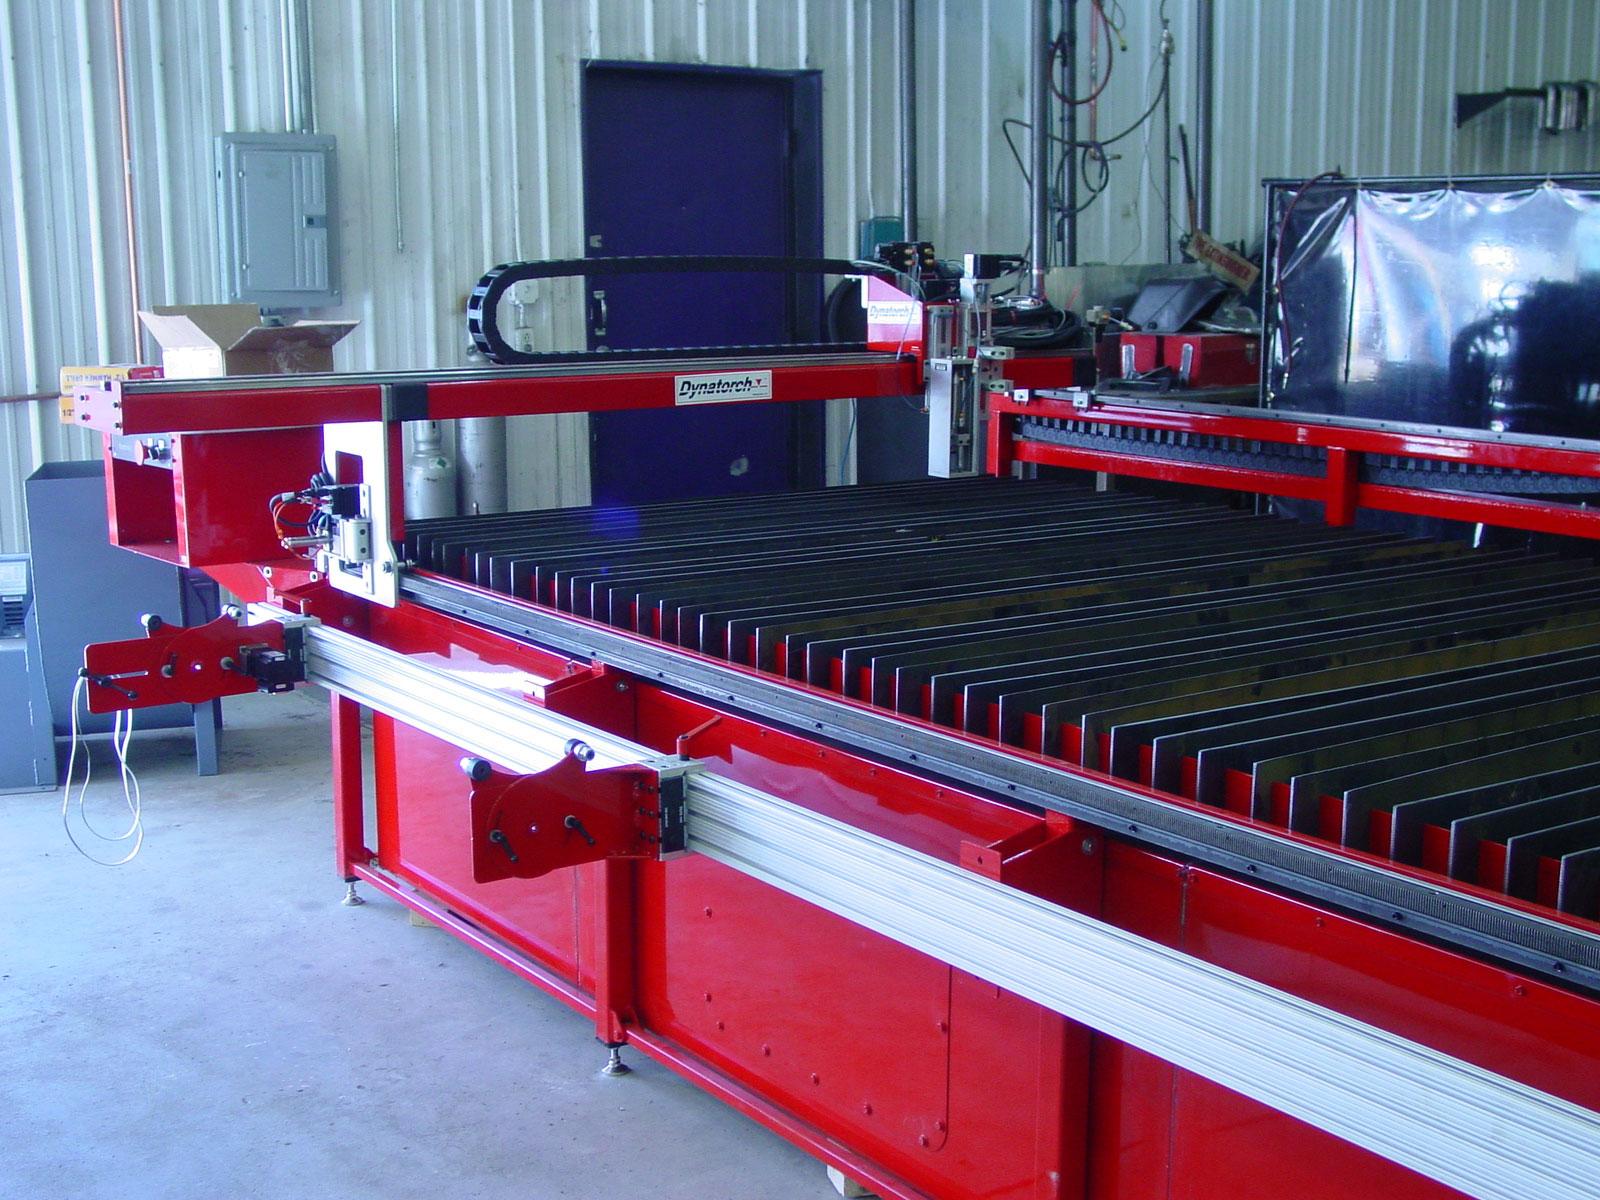 Rocky Mountain Westy's new DynaTorch CNC plasma table